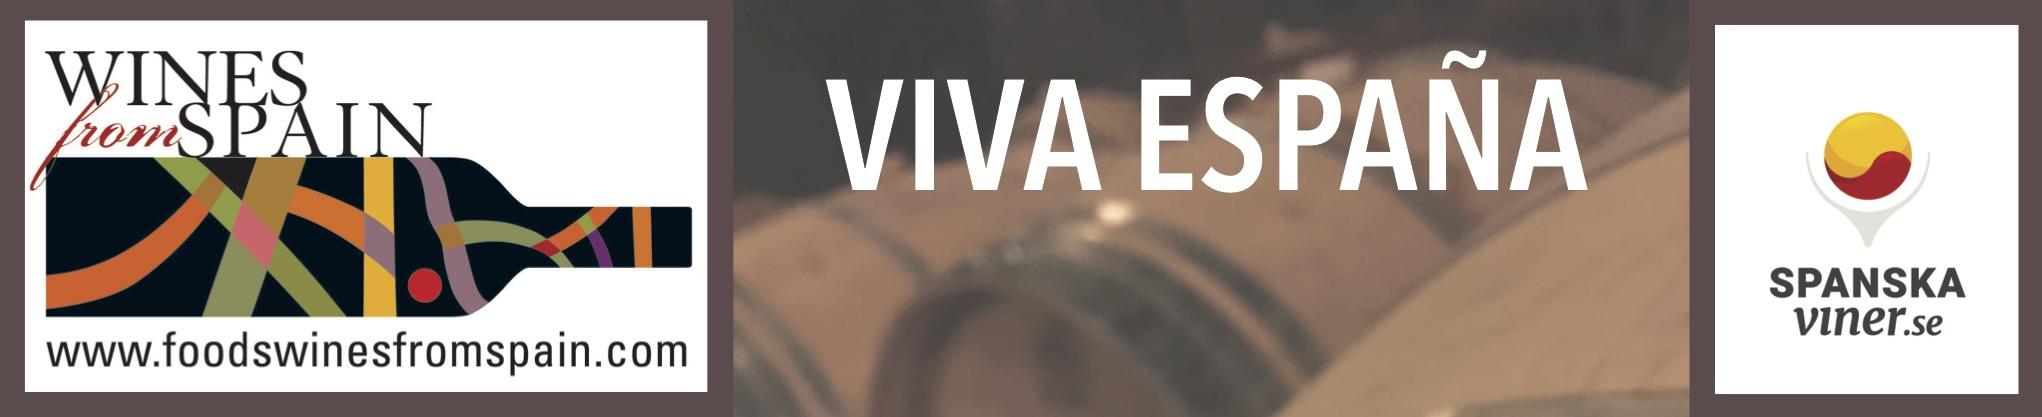 980x200 Spanska Viner